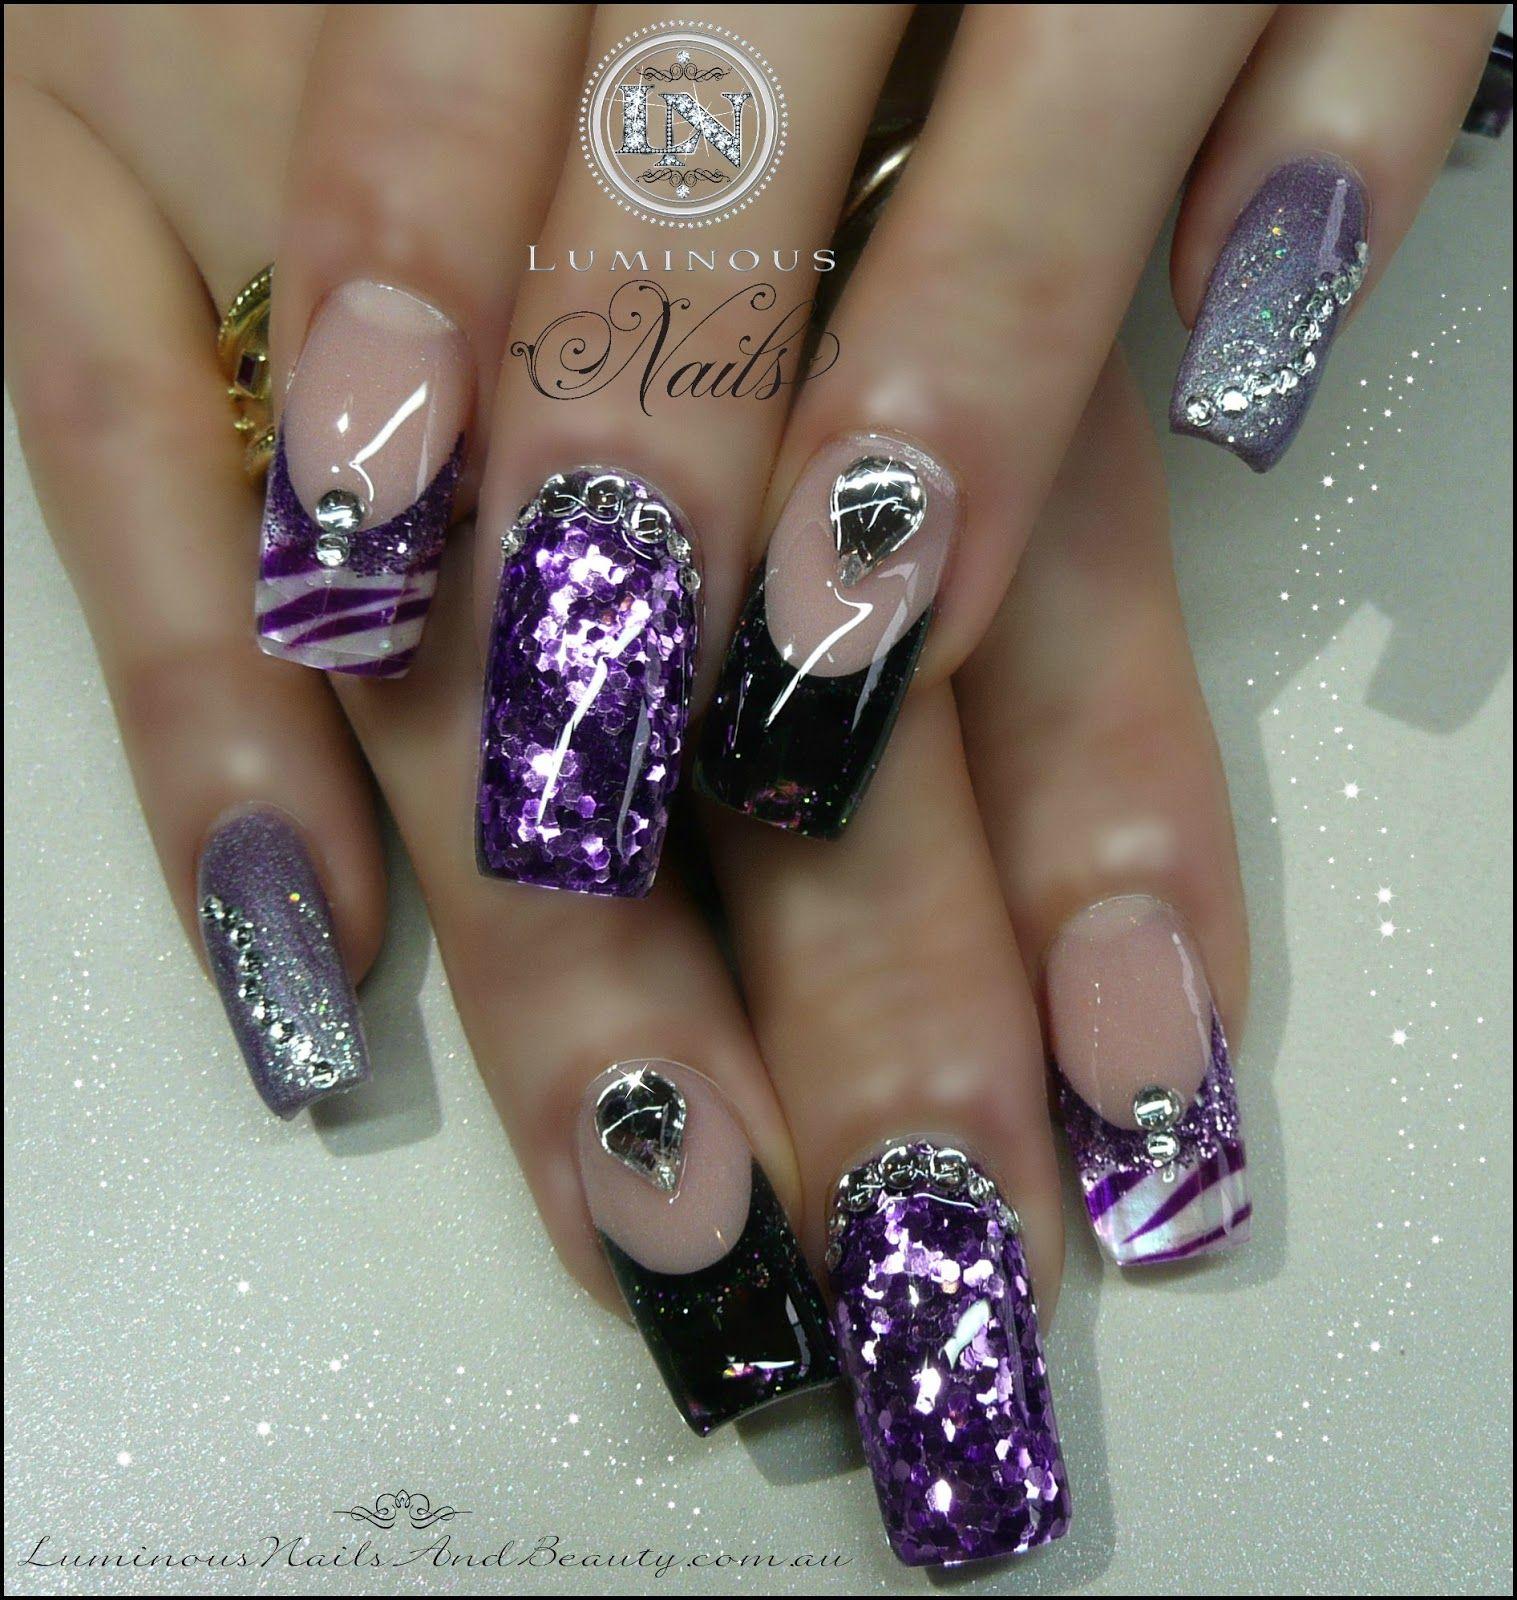 luminous nails: zebra print & black opal pearl nails | nails